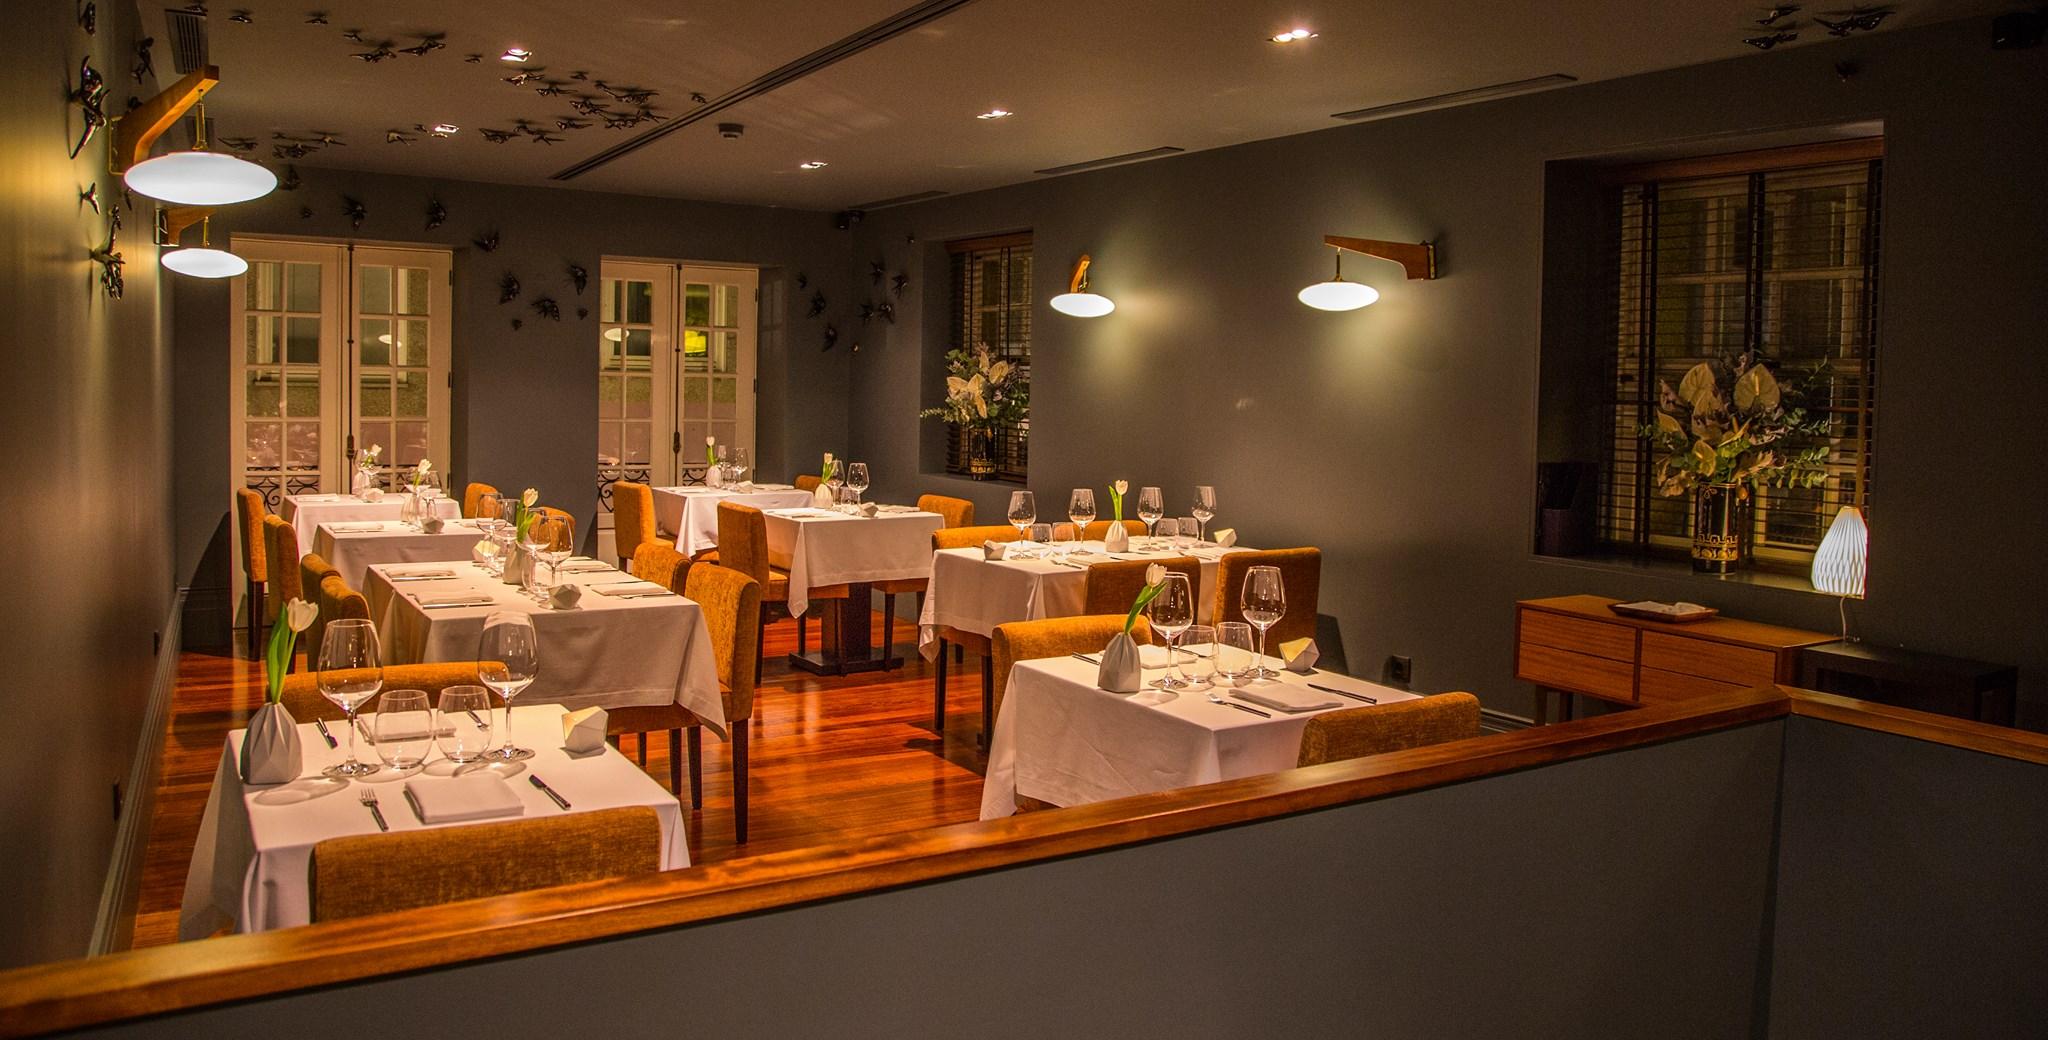 Salle du restaurant Pedro Lemos - Porto